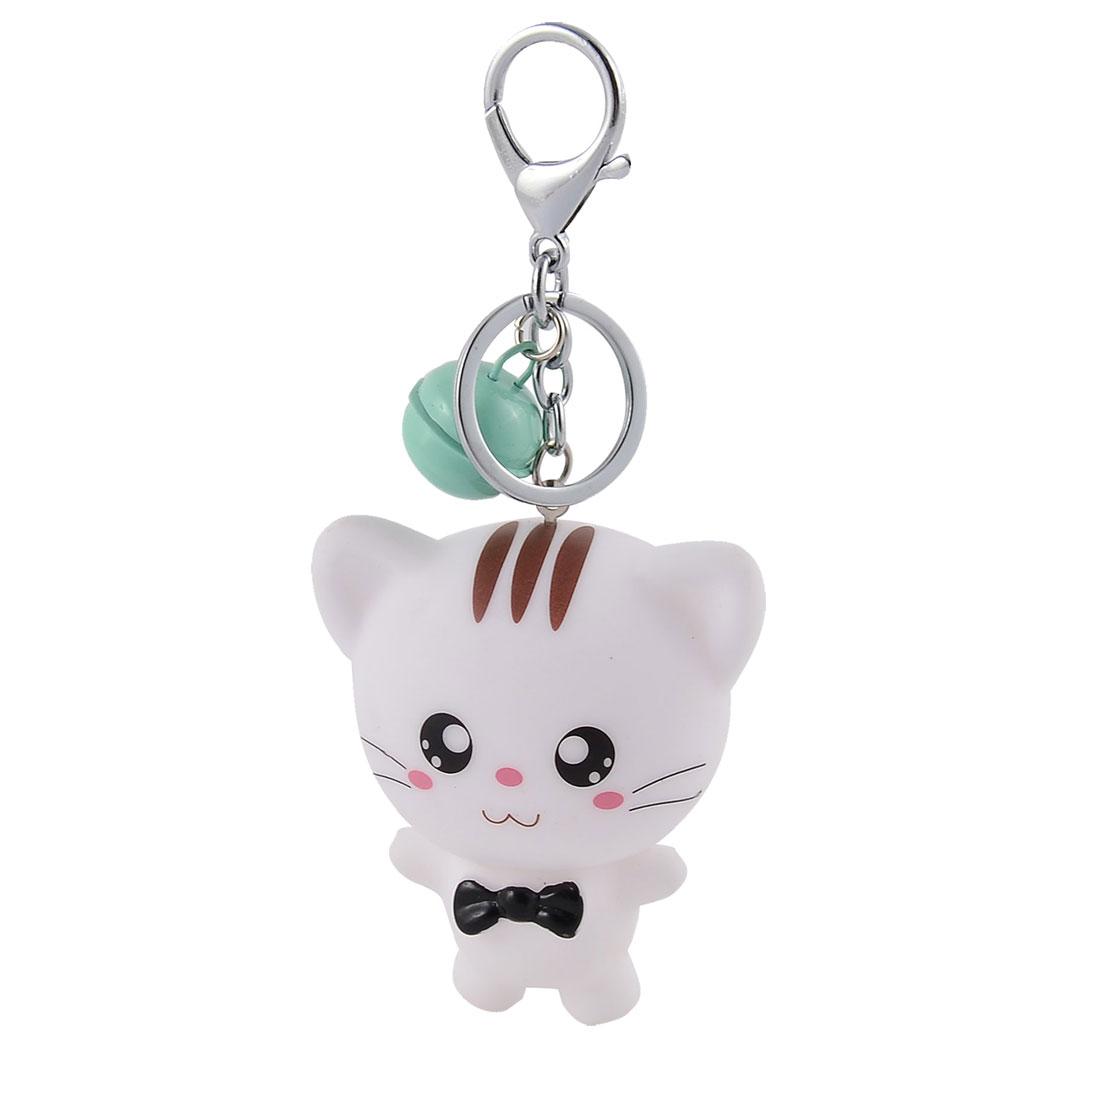 Metal Ring Cat Shaped Pendant Hanging Decor Keychain Key Fob Keyring